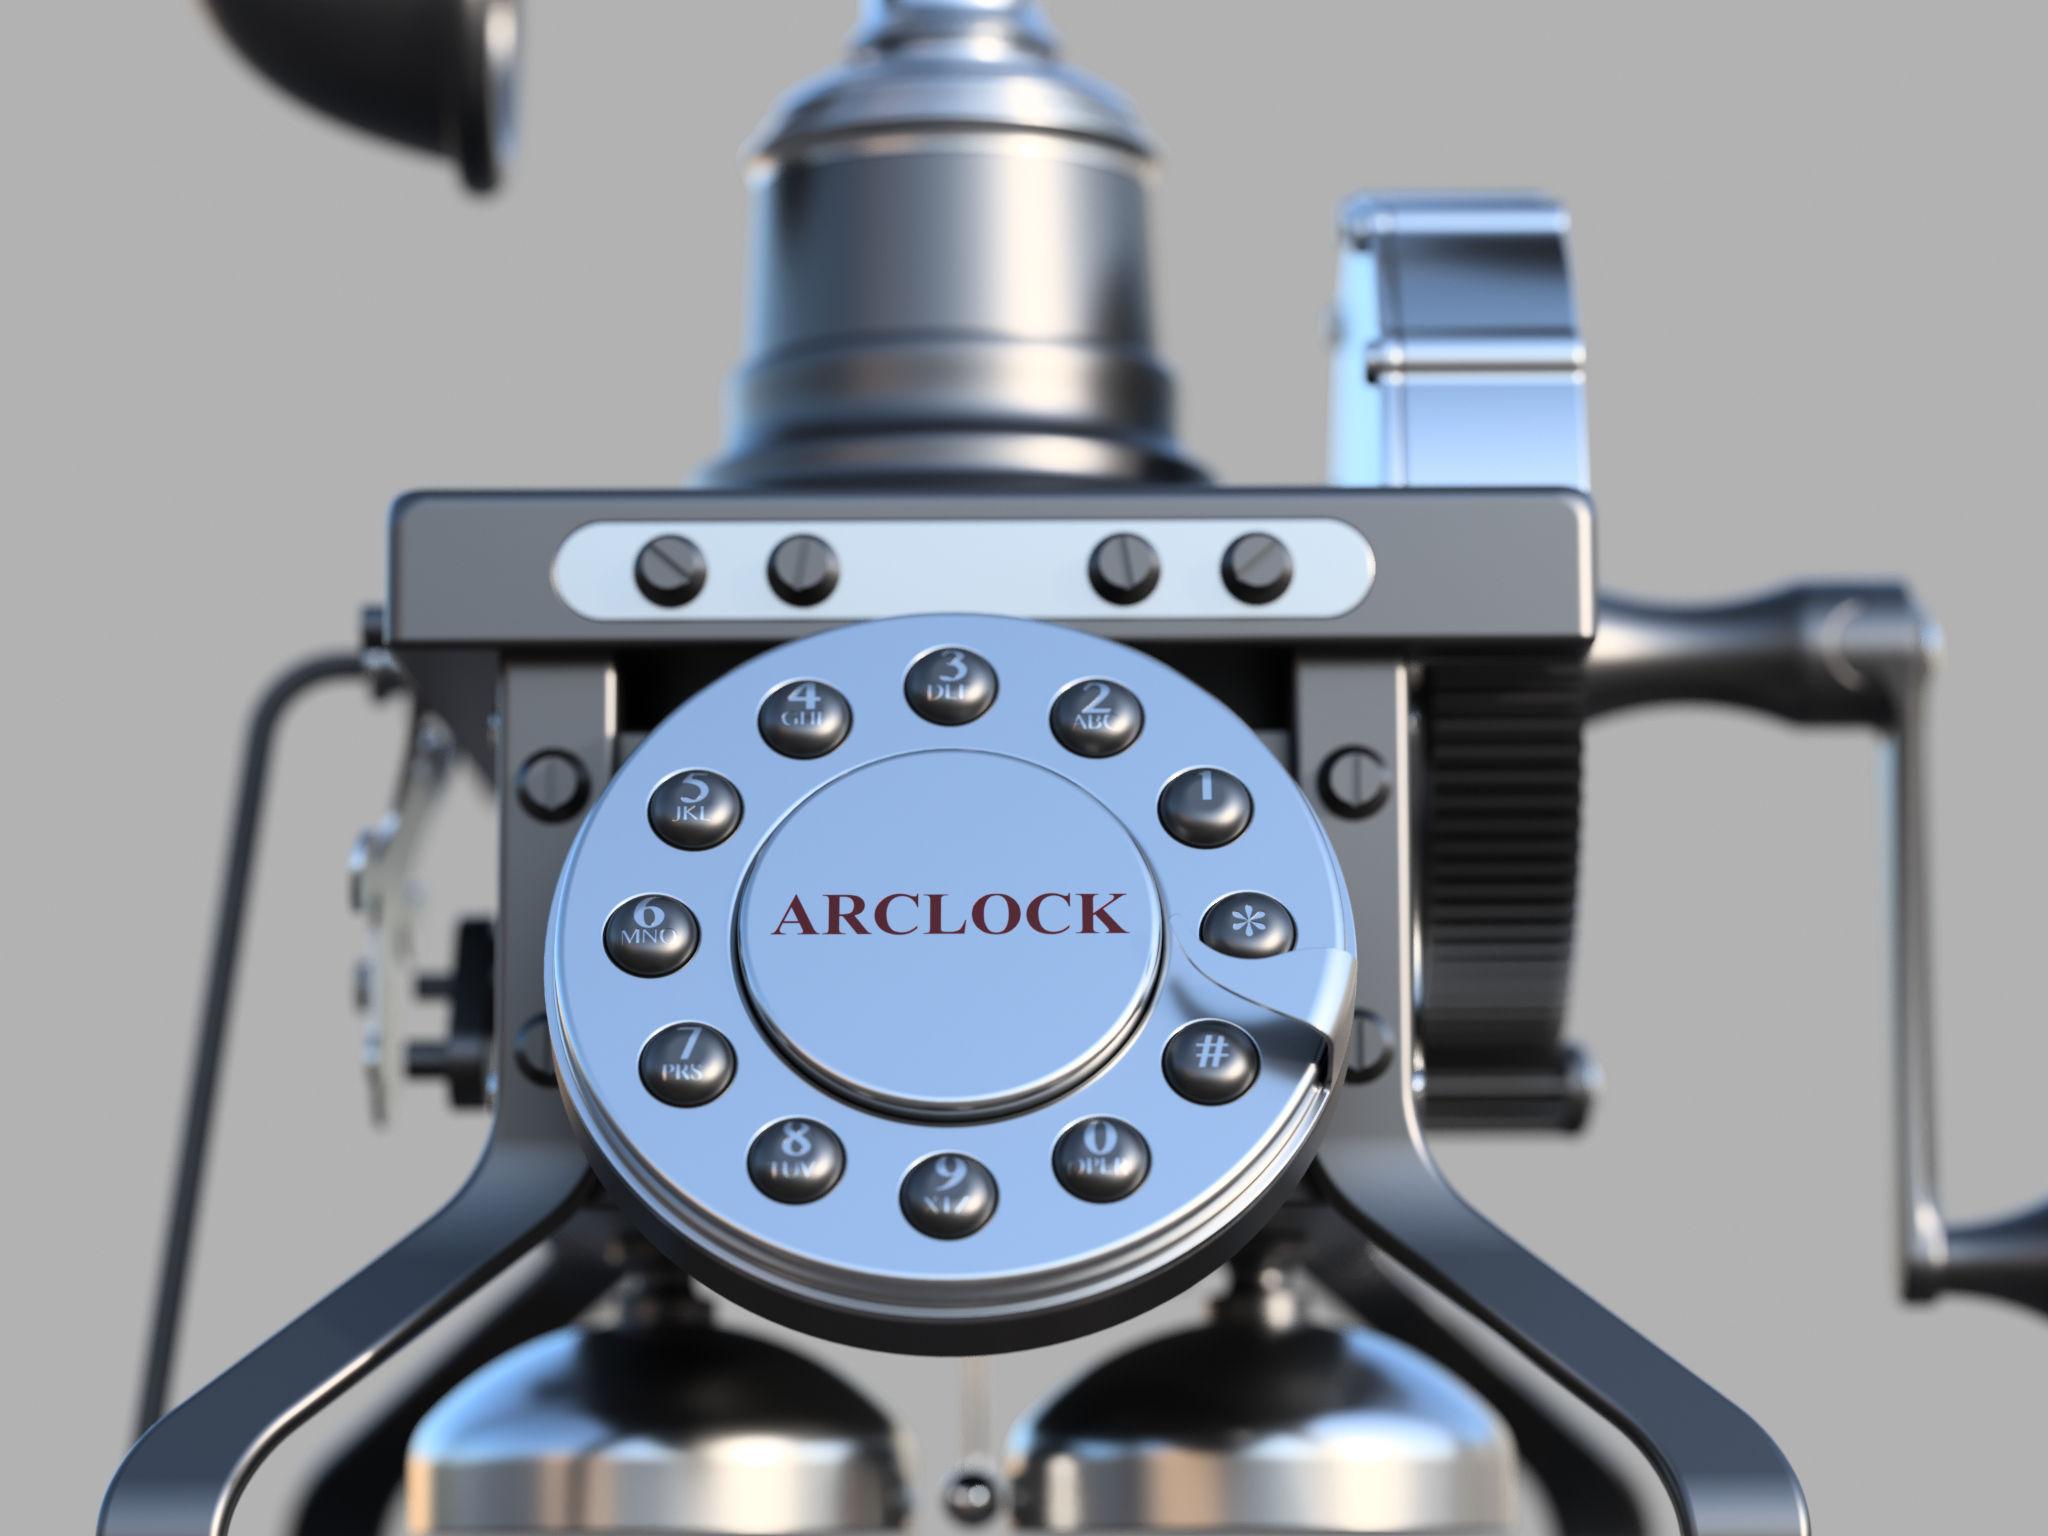 Arclock-phone-2017-jan-05-05-32-31am-000-customizedview1708383645-3500-3500